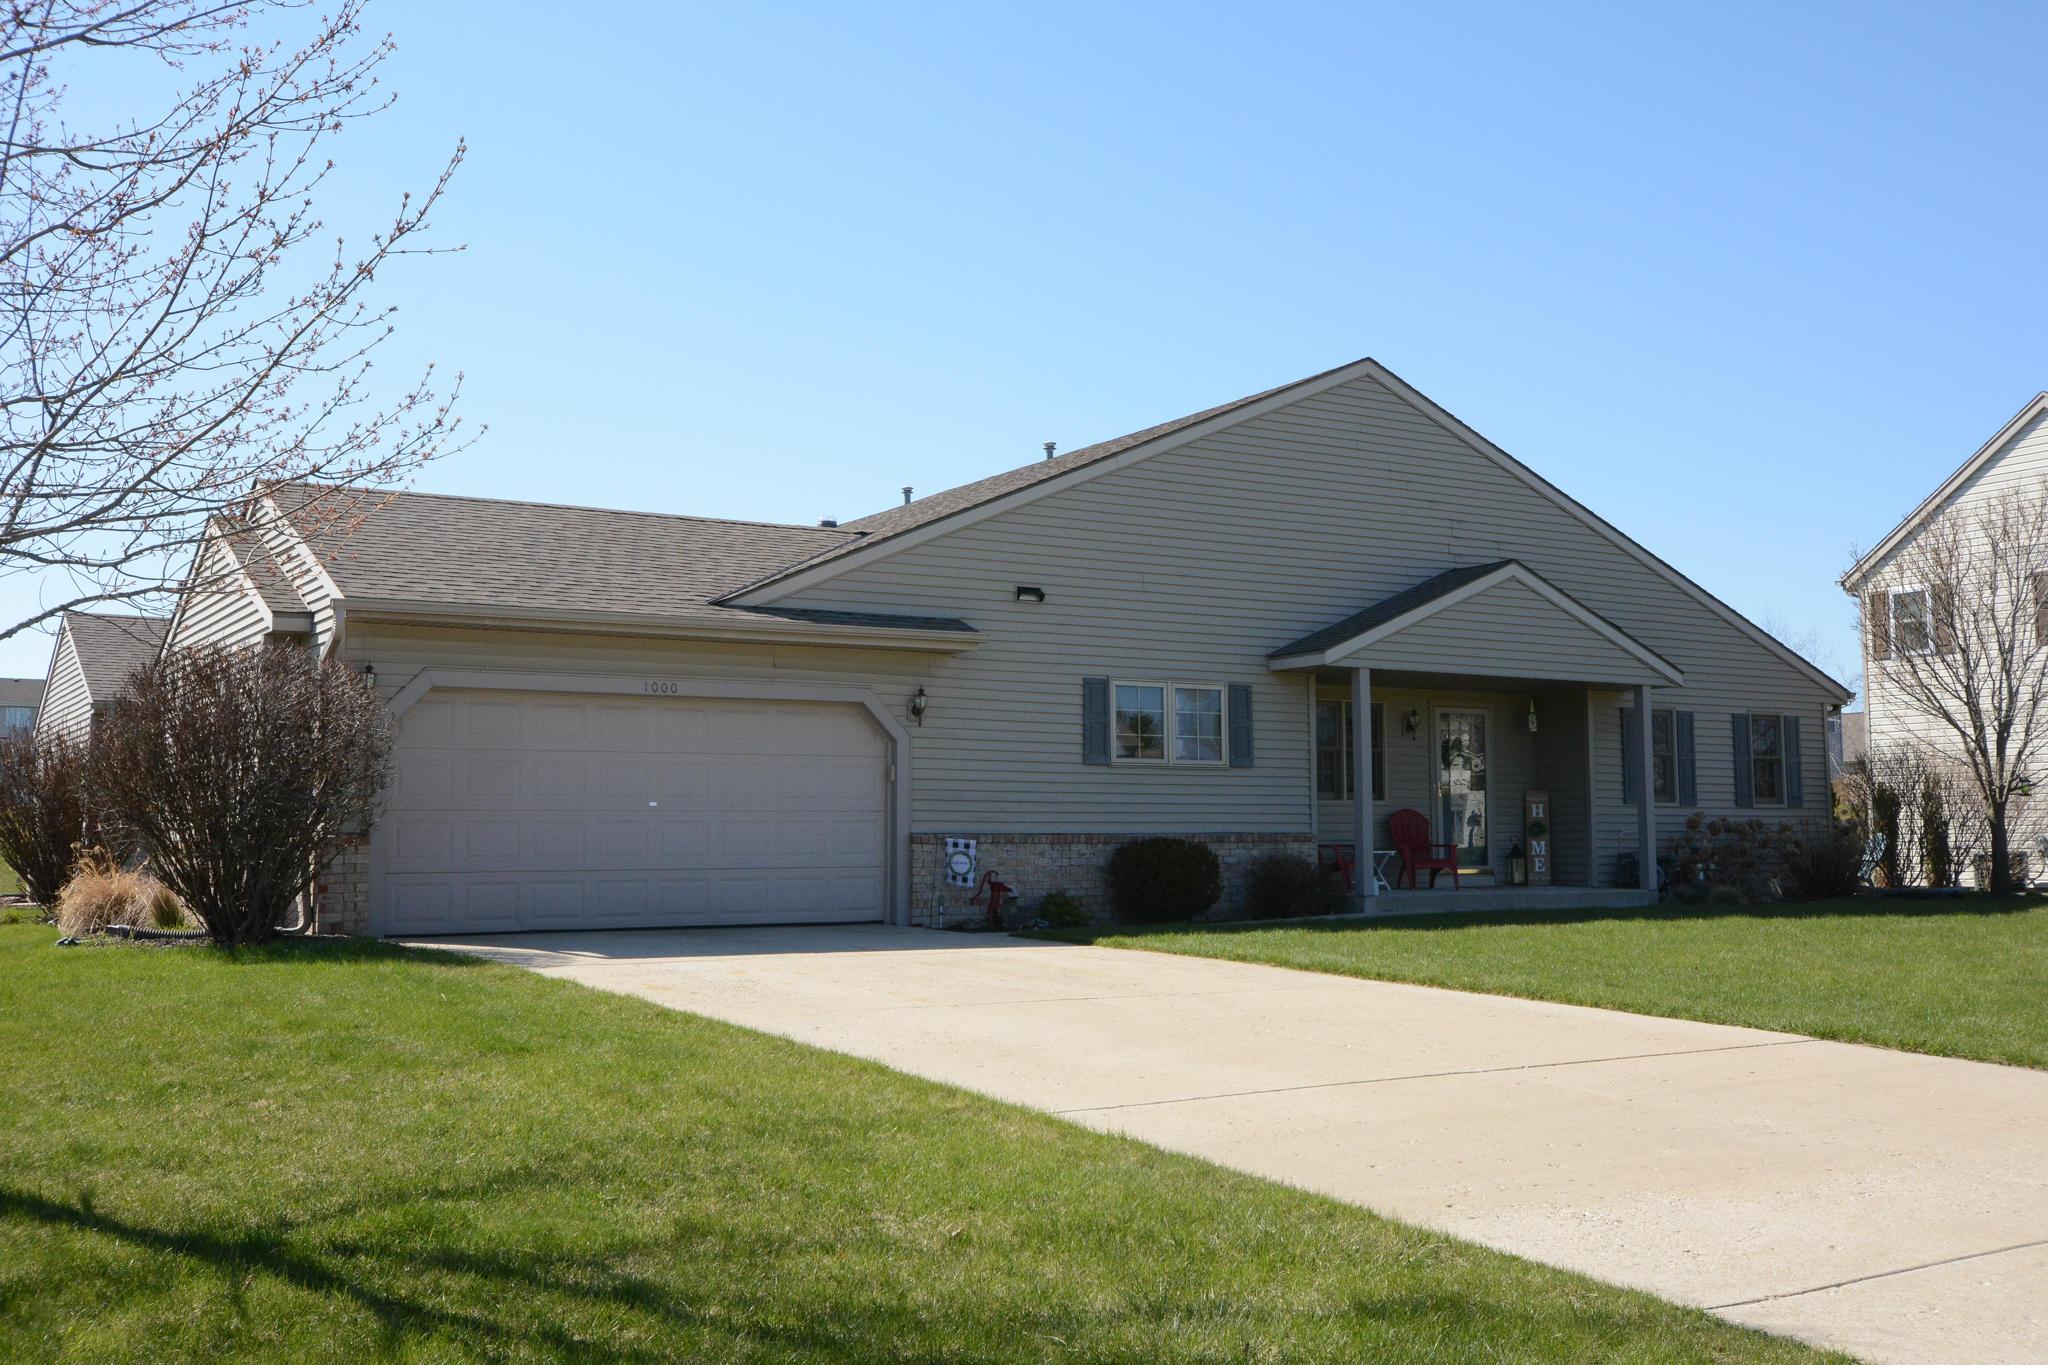 1000 Spring Waters Dr, Oconomowoc, Wisconsin 53066, 2 Bedrooms Bedrooms, ,2 BathroomsBathrooms,Condominiums,For Sale,Spring Waters Dr,1,1685753